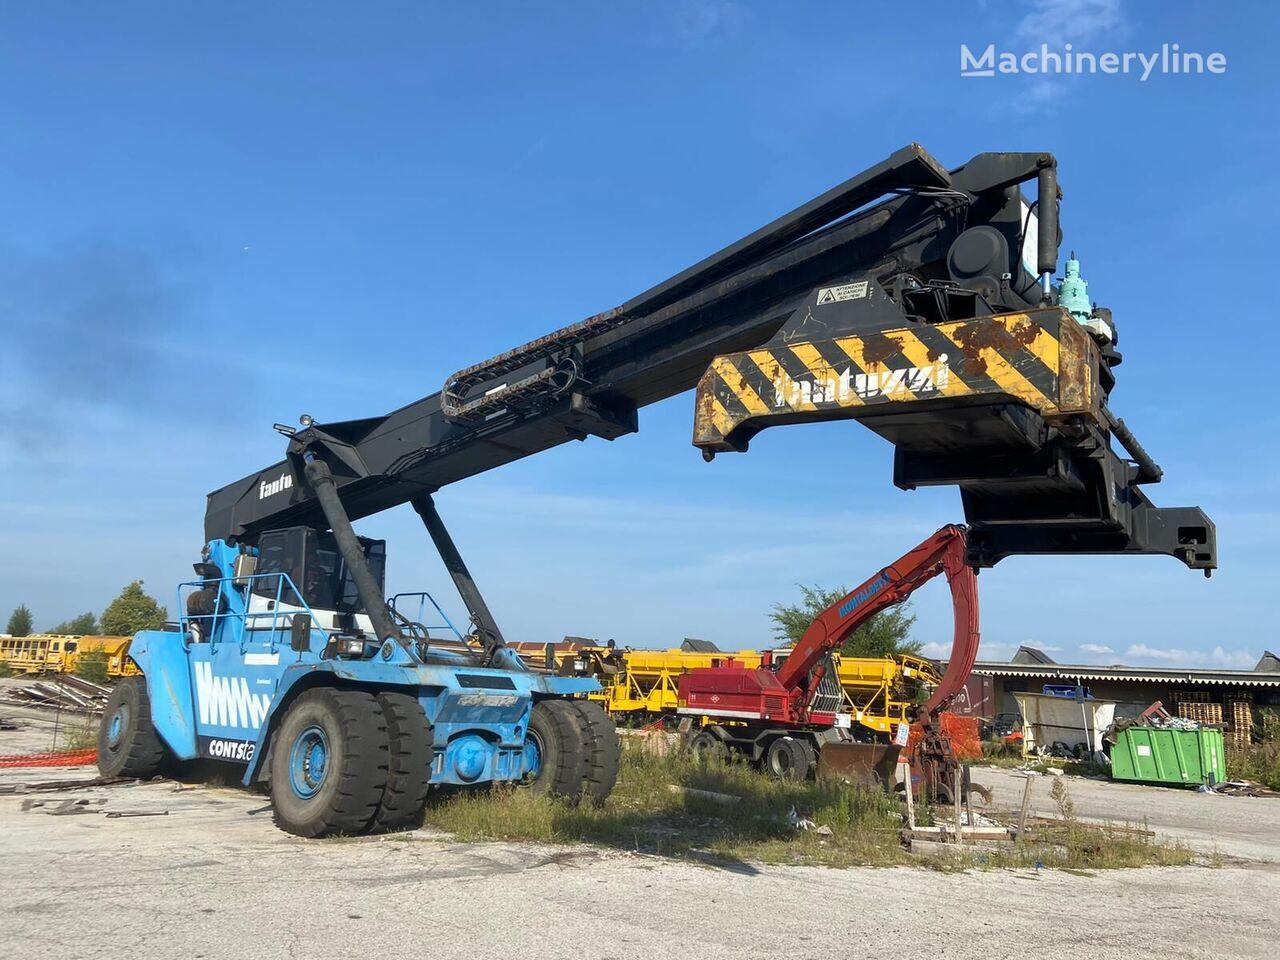 carrello elevatore per container FANTUZZI CS 45 KM   45 TONS MAX CAPACITY